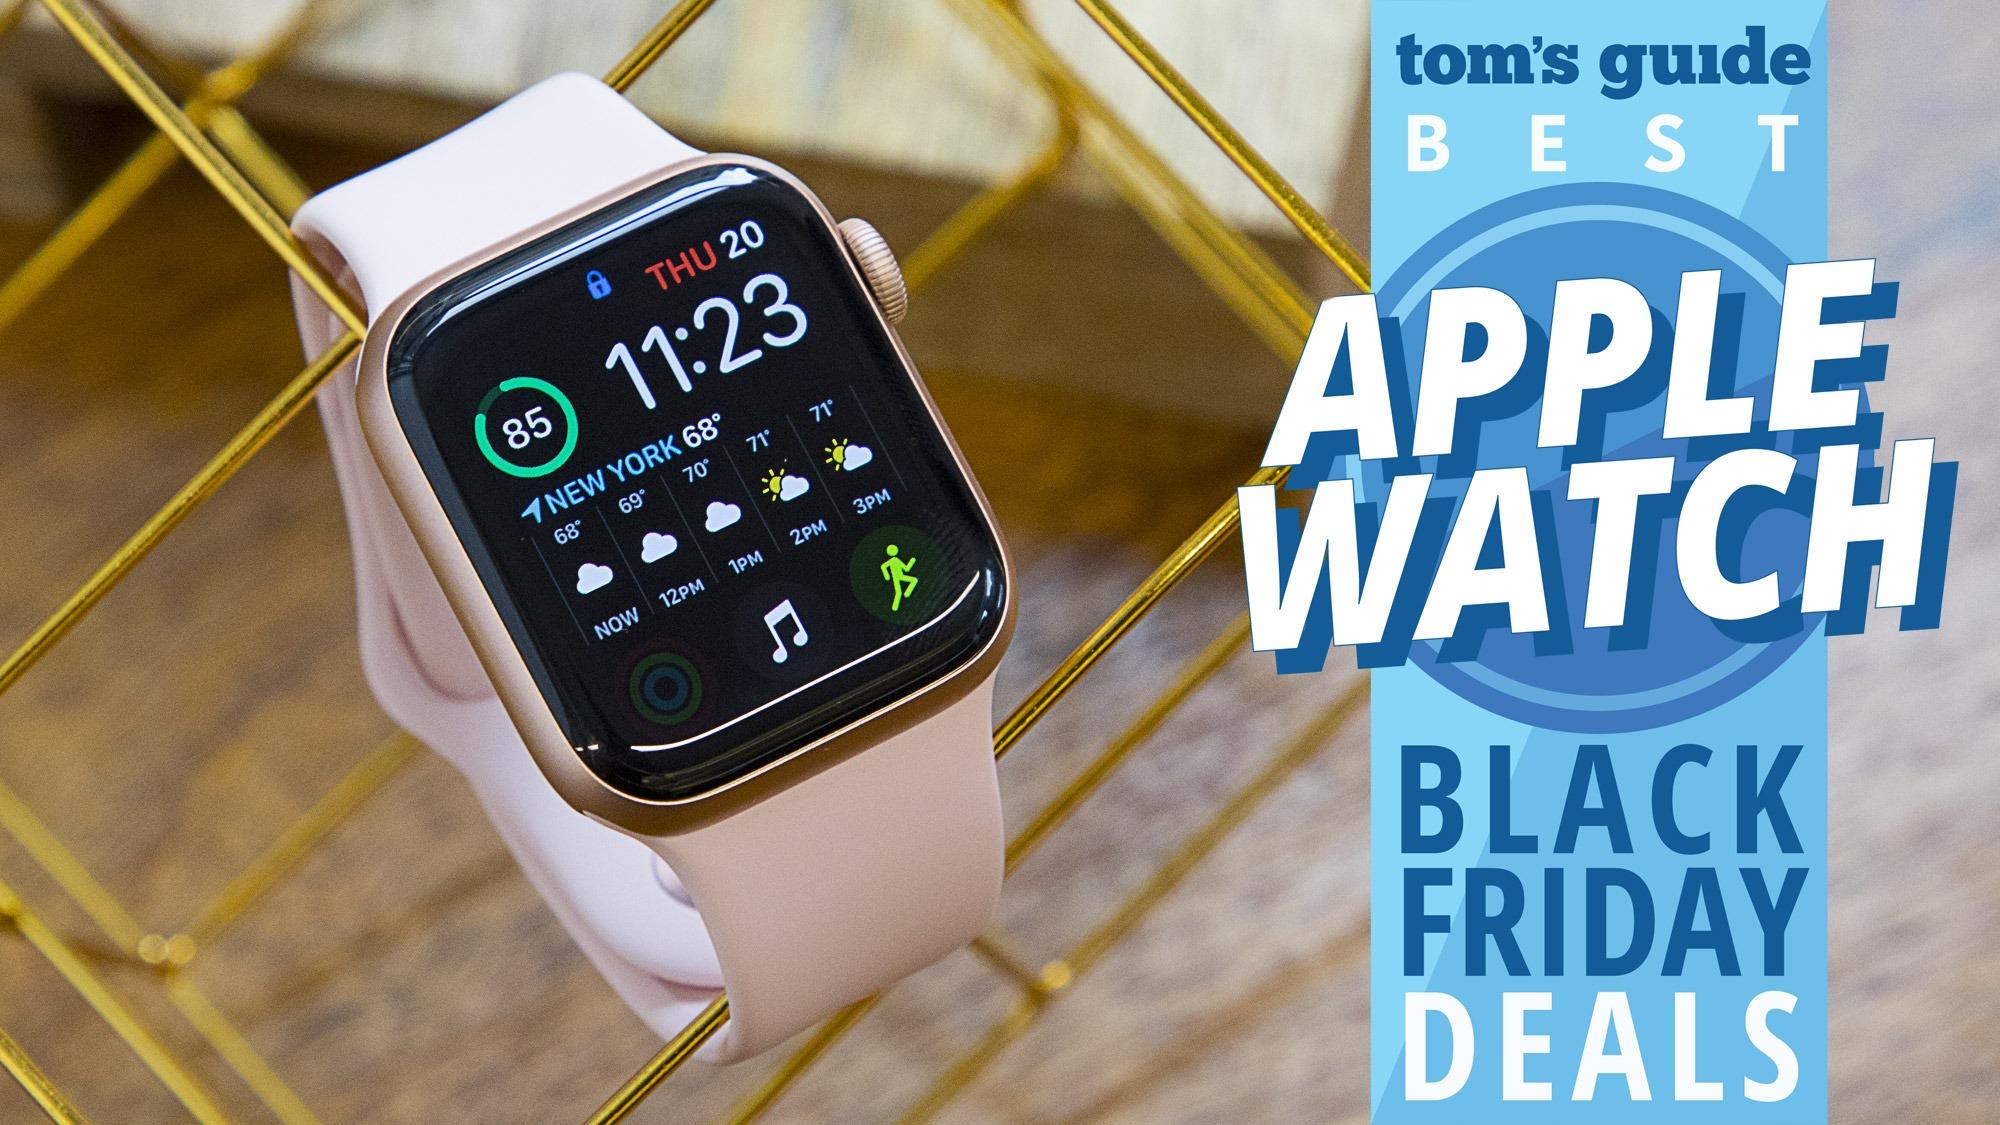 Apple-Watch-3-At-199-In-Walmart's-Black-Friday-Sale